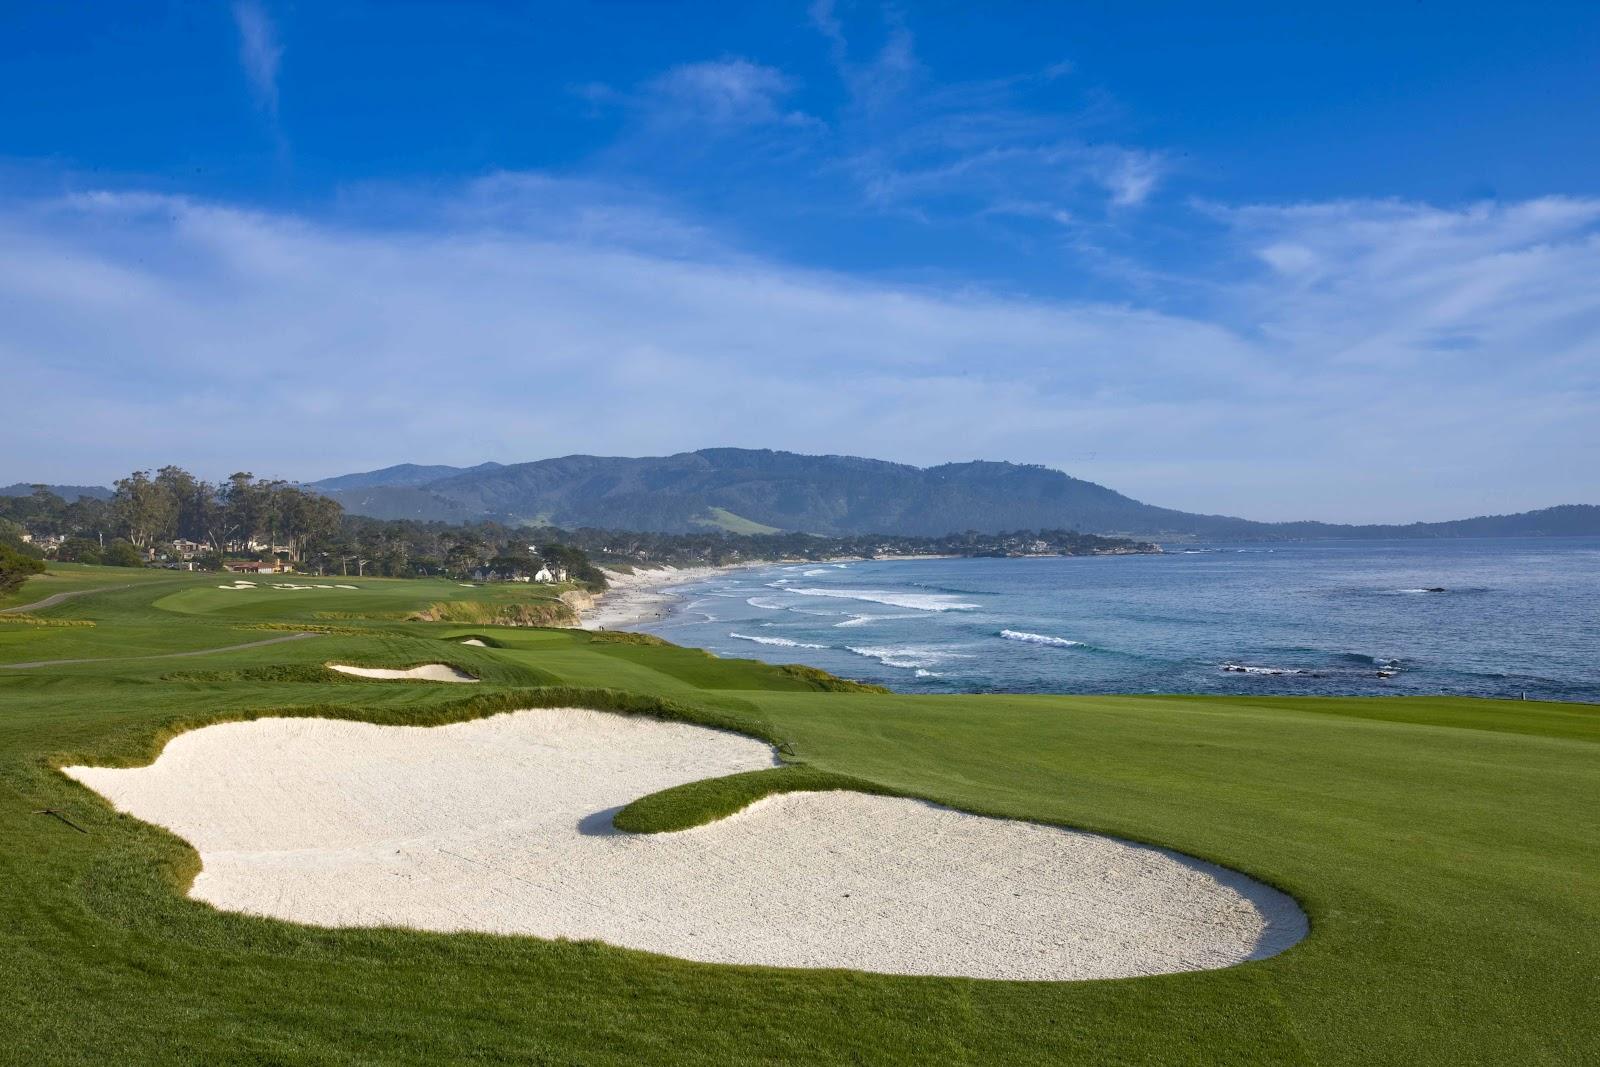 Trololo Blogg Pebble Beach Golf Wallpaper Hd